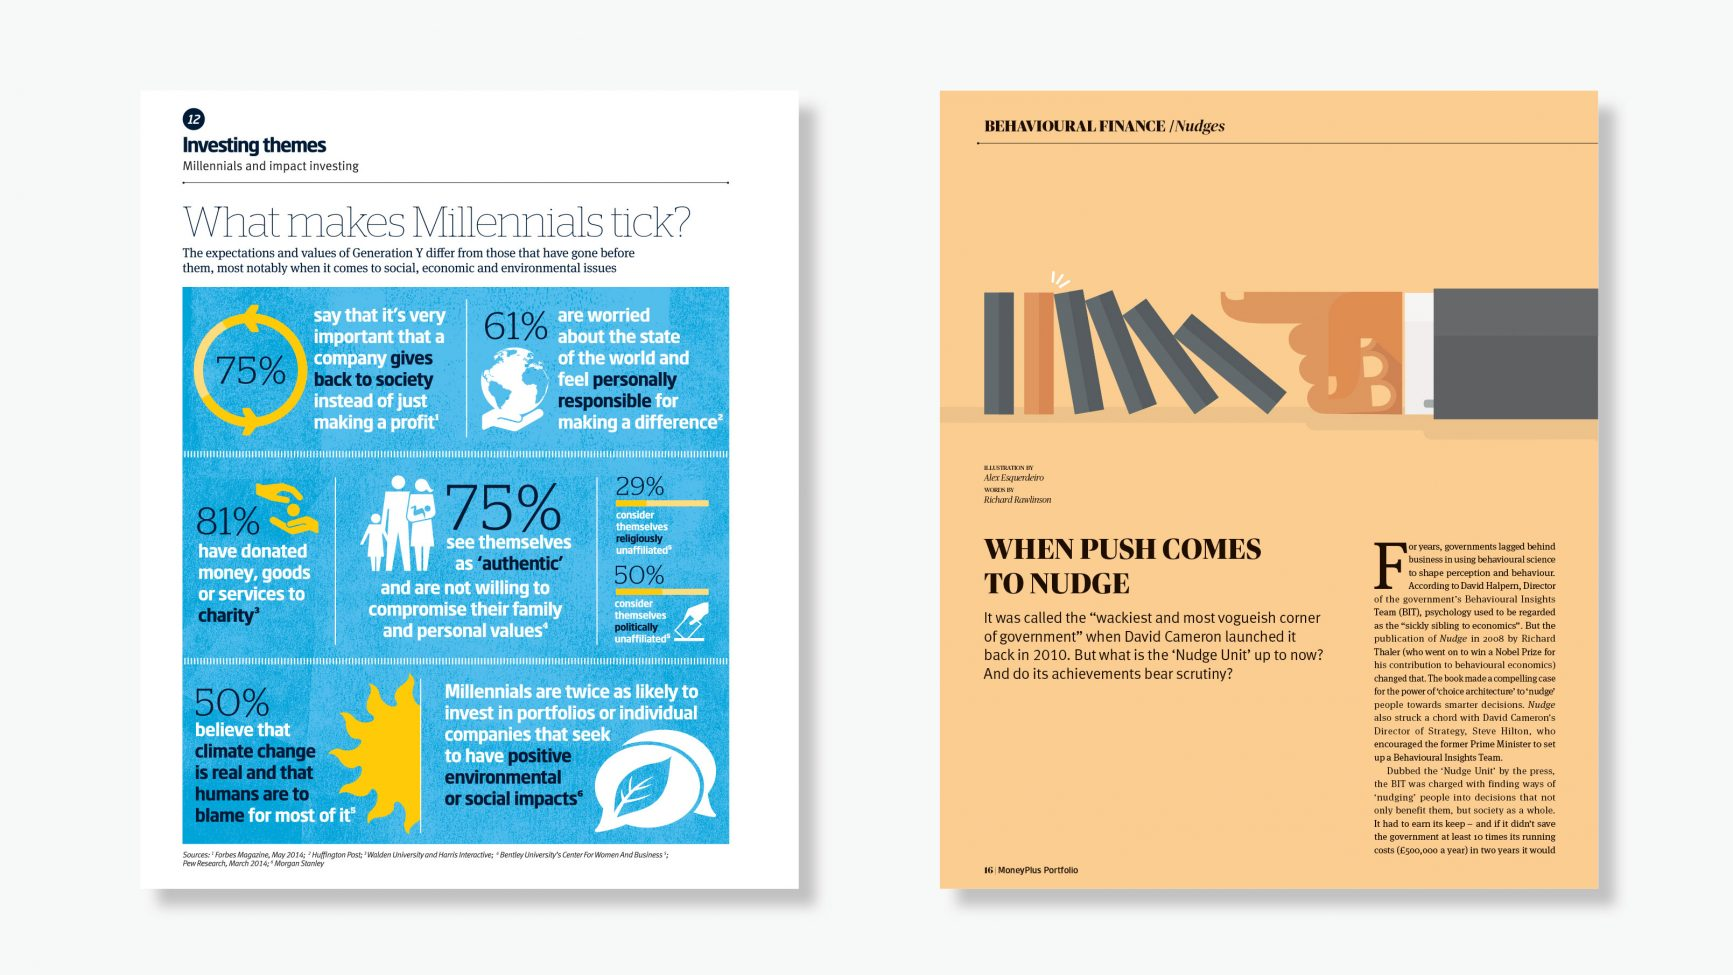 millennials investing portfolio magazine standard life alex esquerdeiro